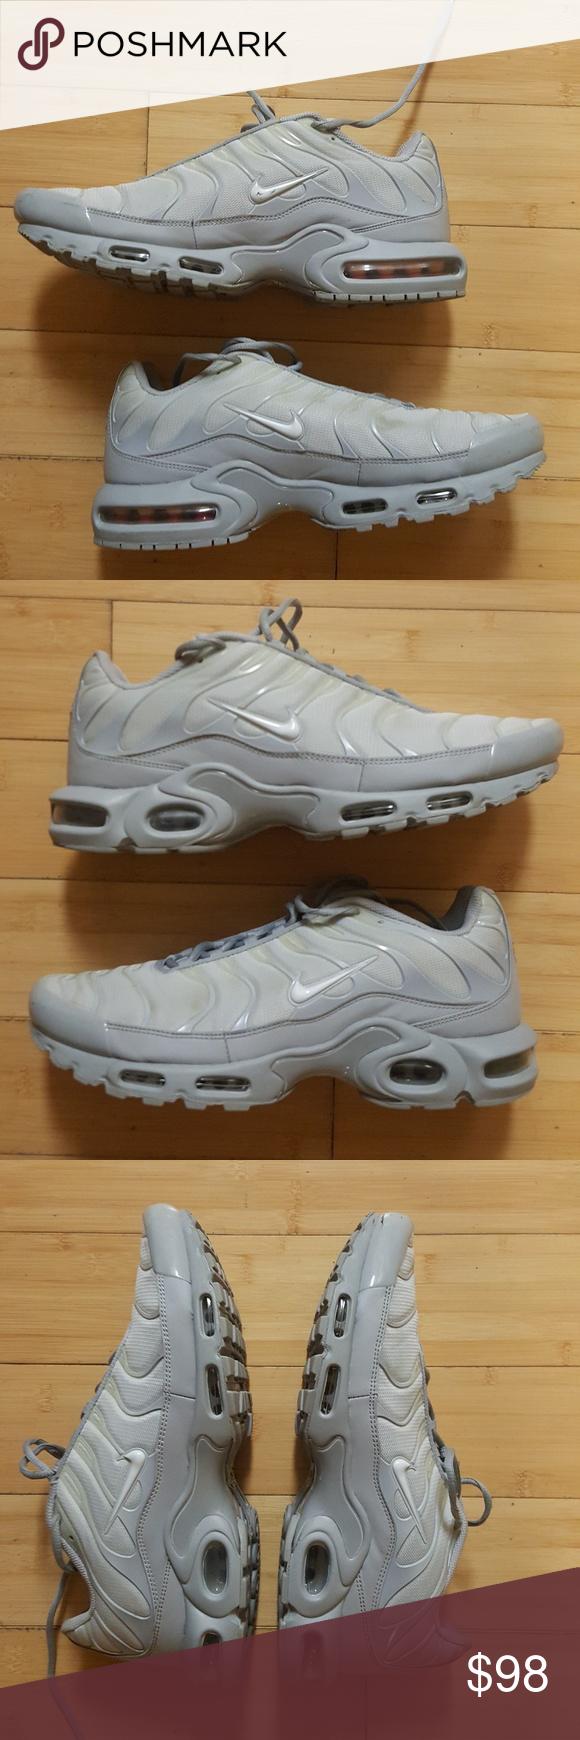 852630 029 Nike Air Max Plus Lifestyle Shoes